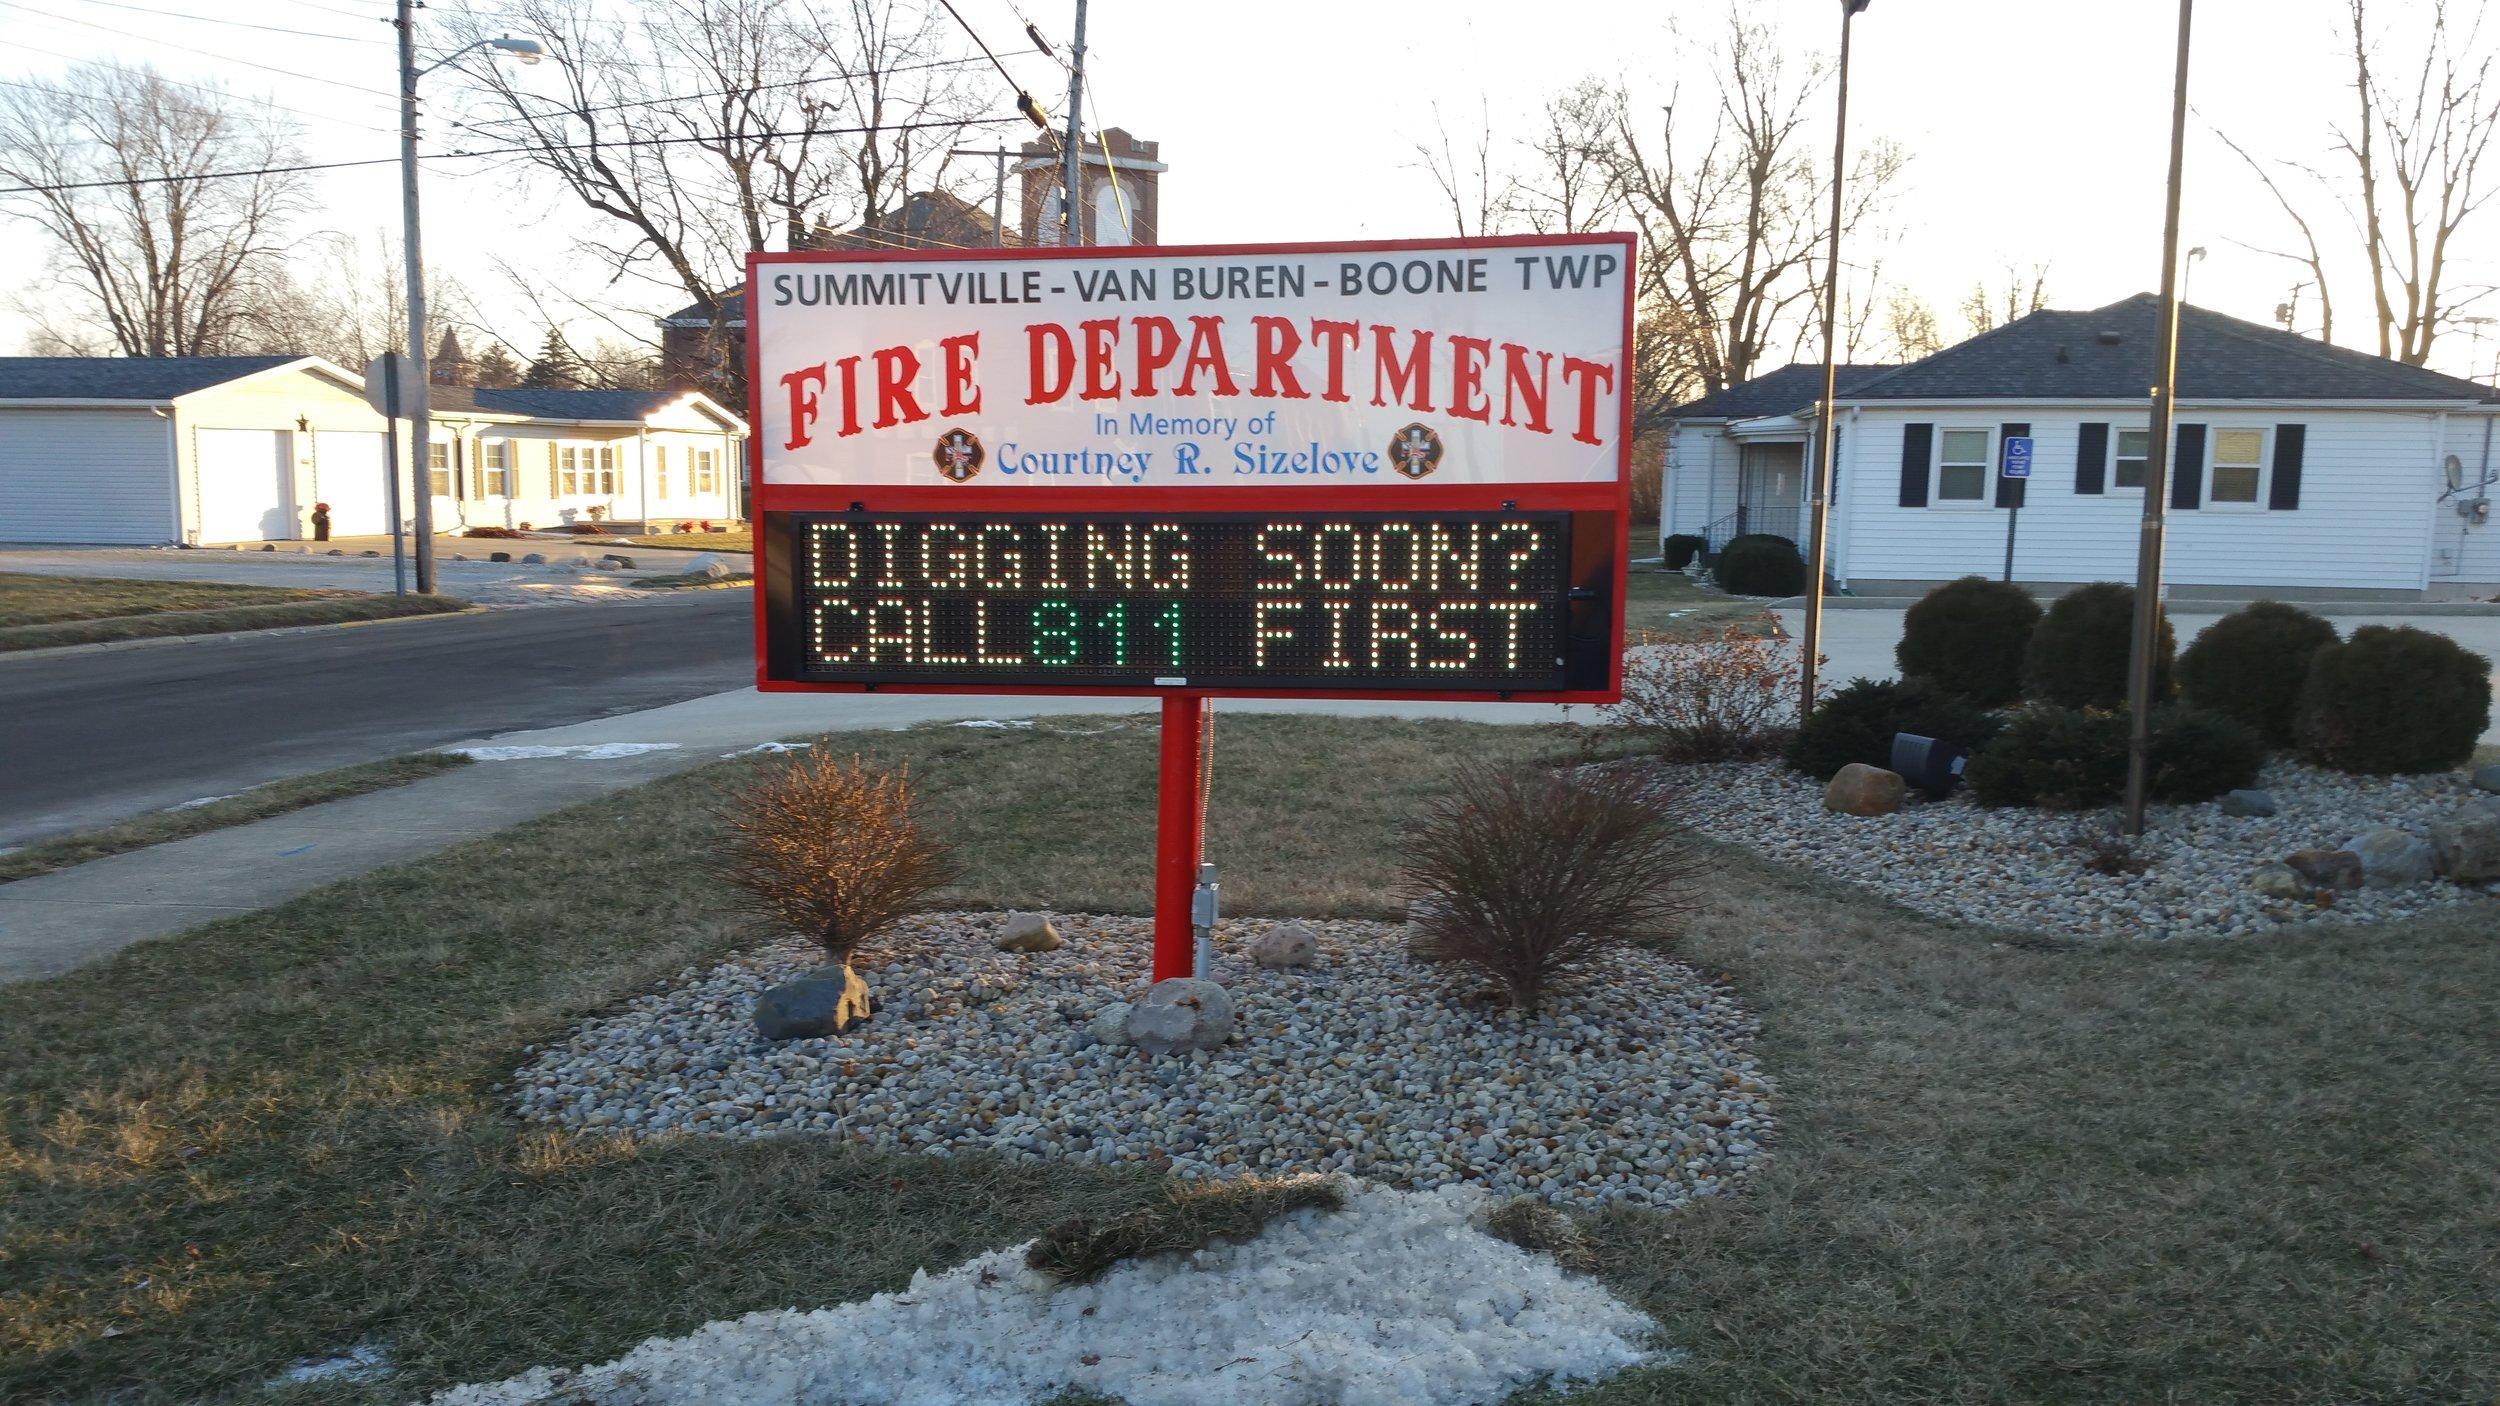 Summitville Fire Department Inc.